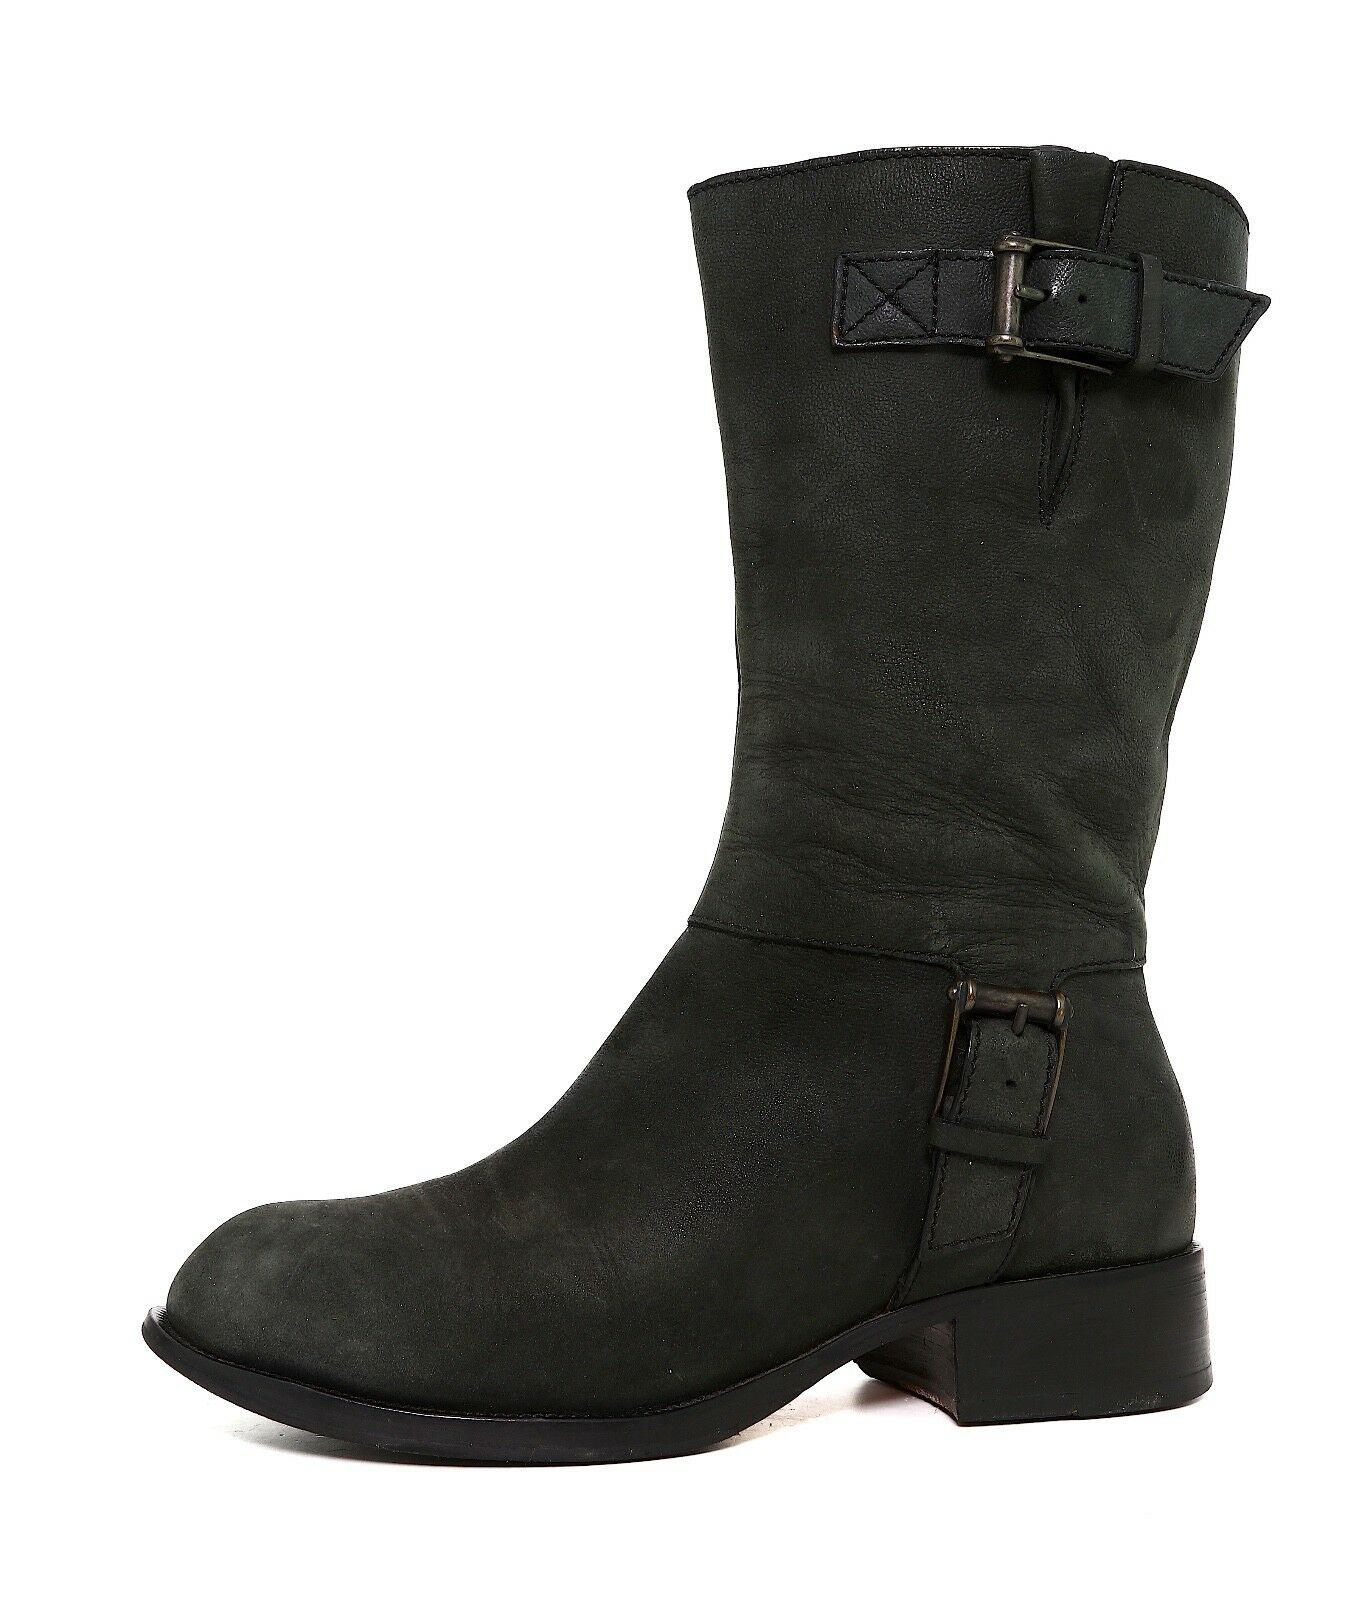 Cole Haan Air Leora Mid Calf Leather Boot Black Women Sz 7 B 5778 *